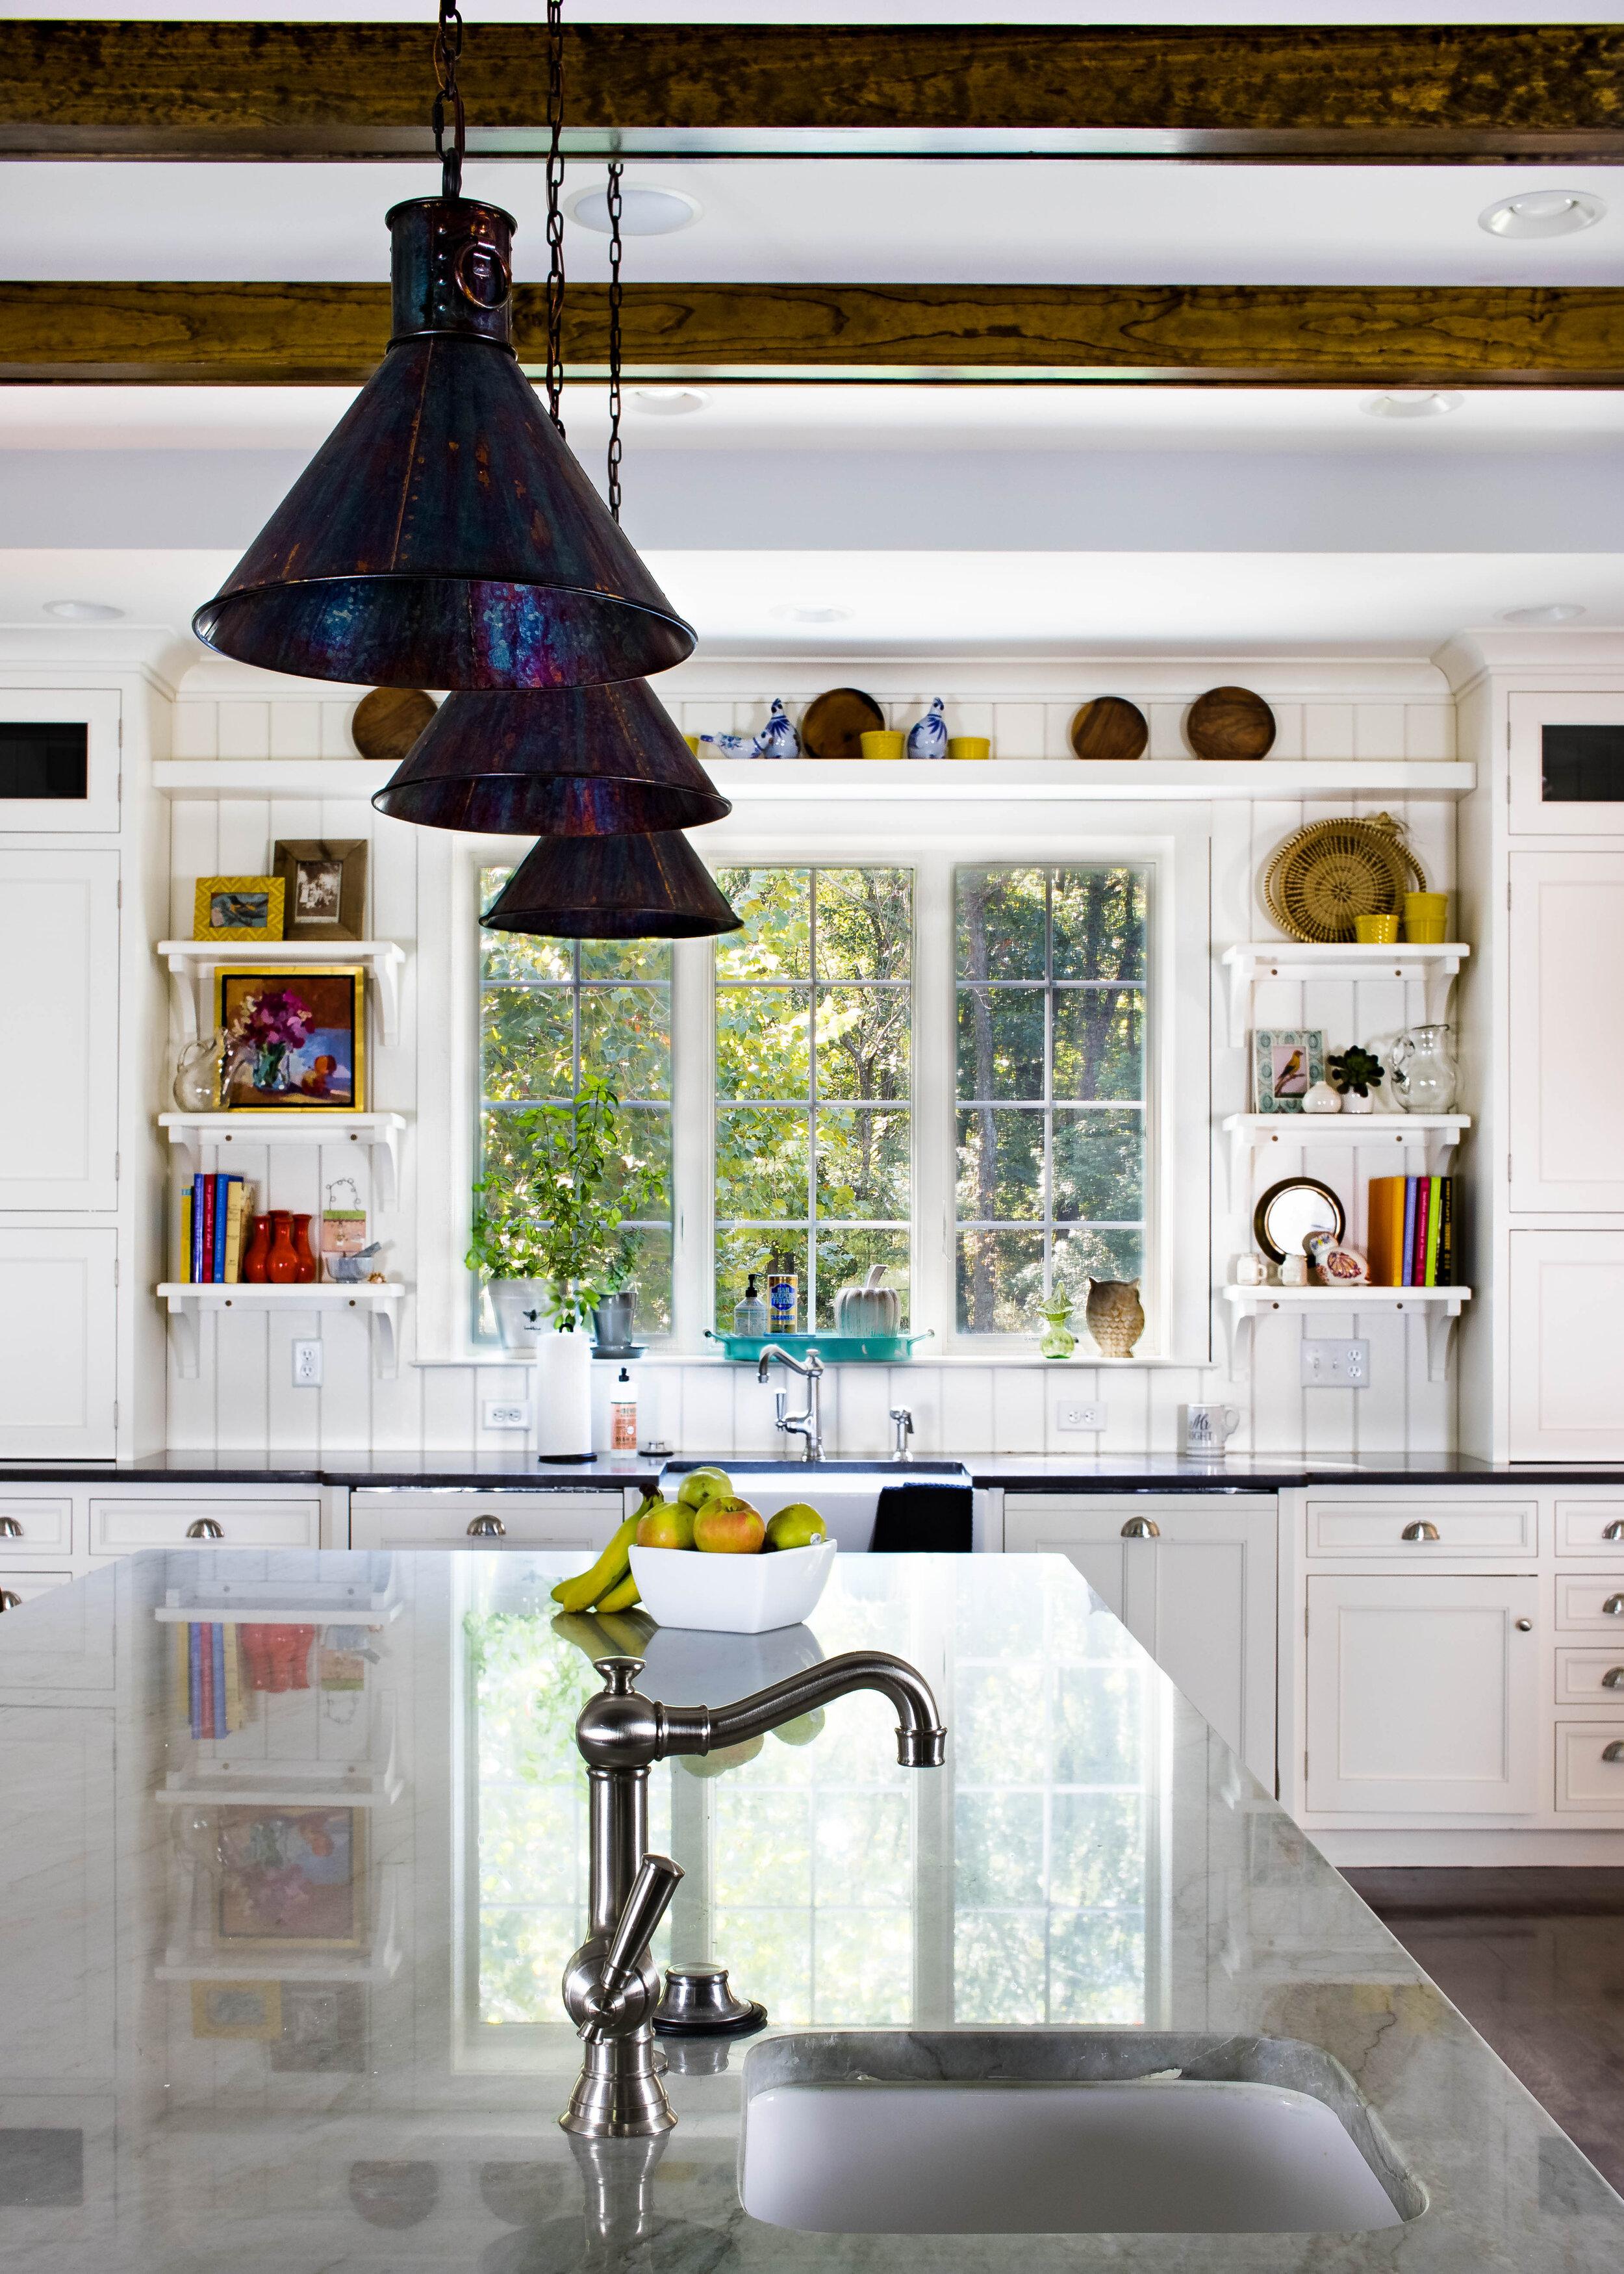 colorful-family-friendly-chefs-kitchen-design-open-shelves